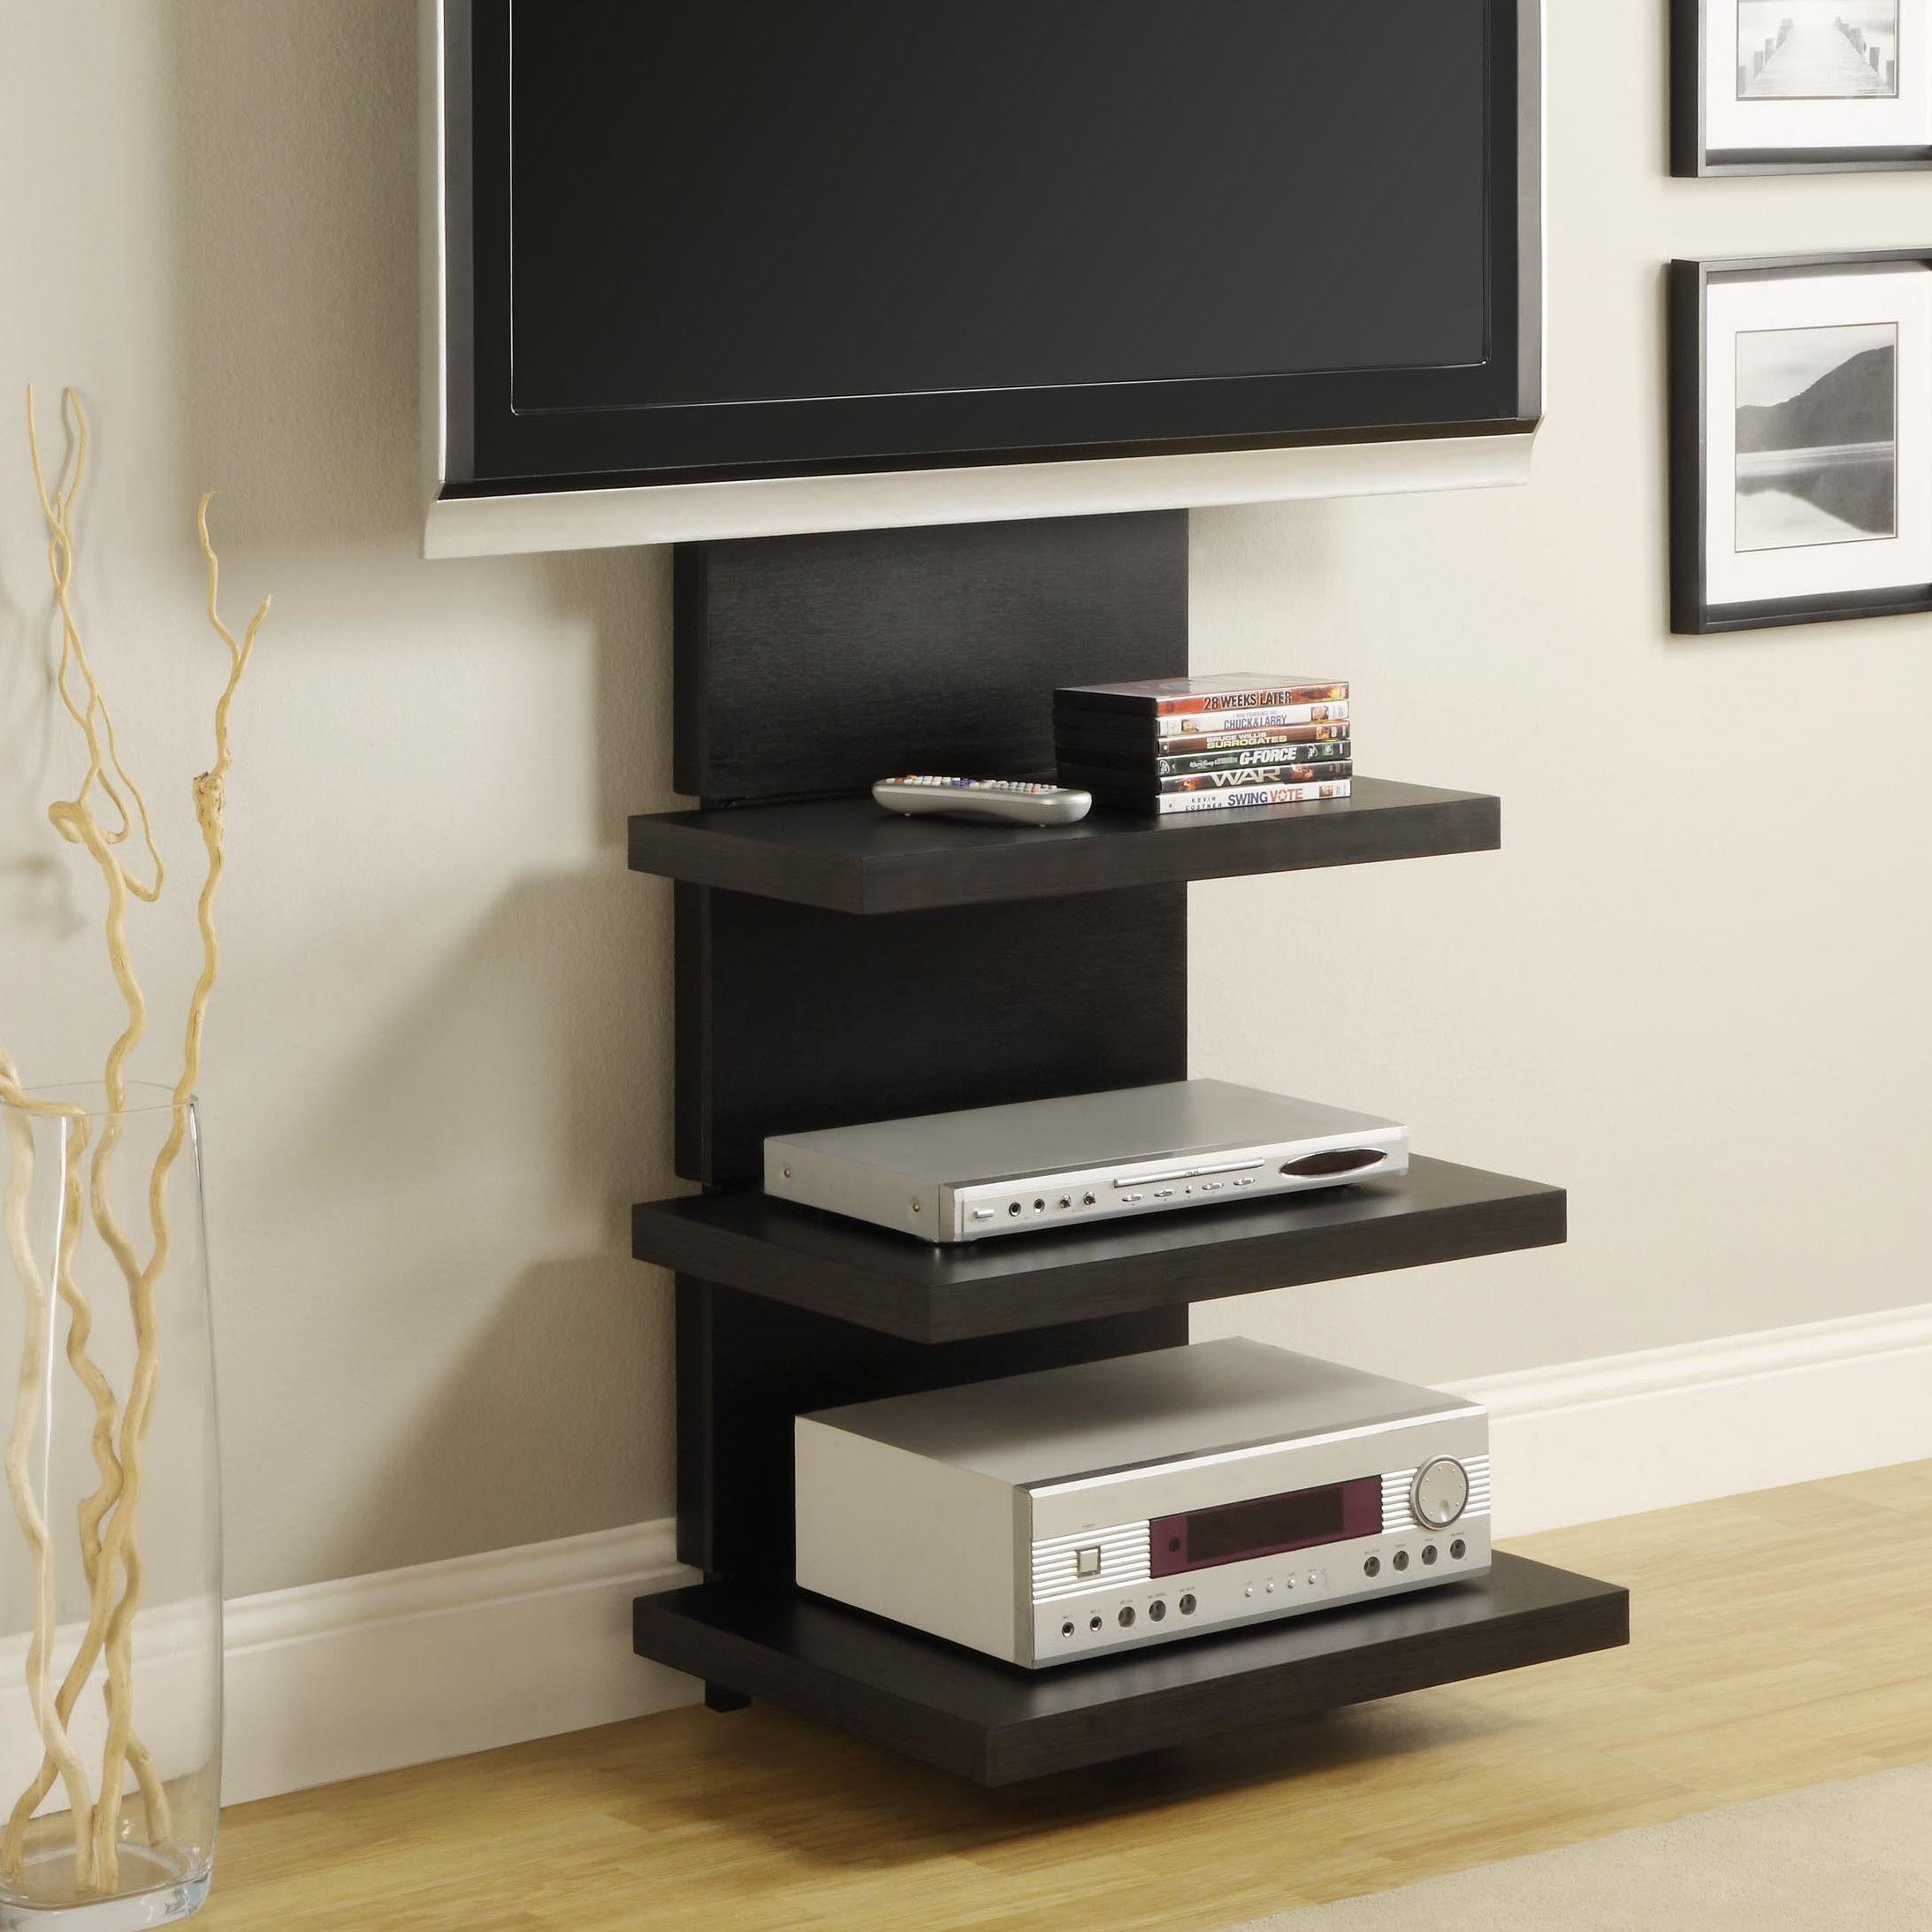 small tv next to wood stove secret ravine wall mount tv stand rh pinterest com